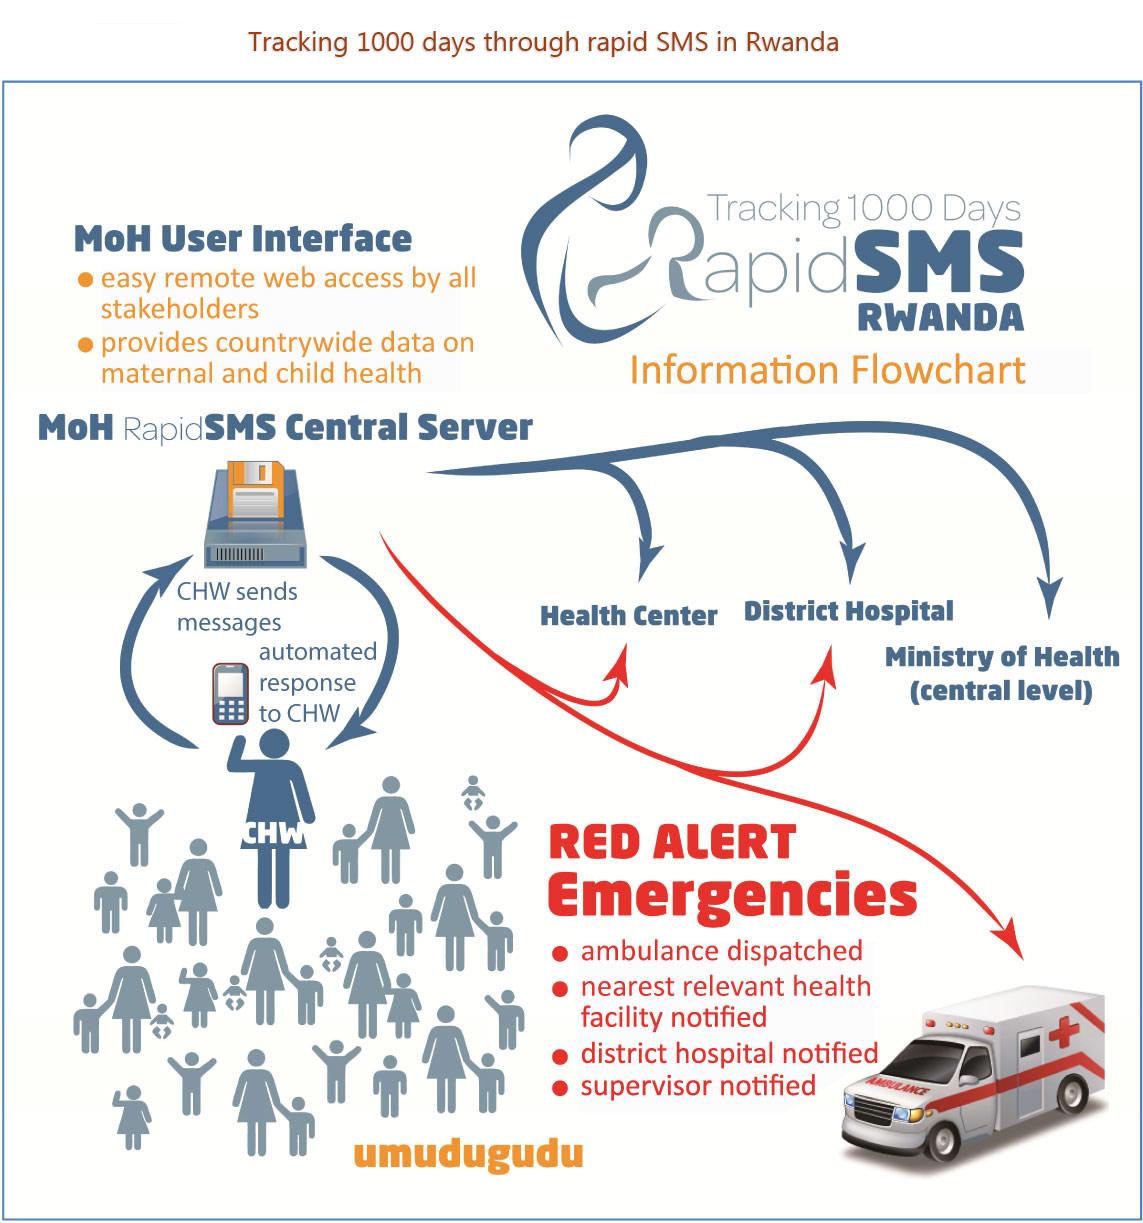 Photo-4-How-Rwanda-Rapid-SMS-works-illustration-02